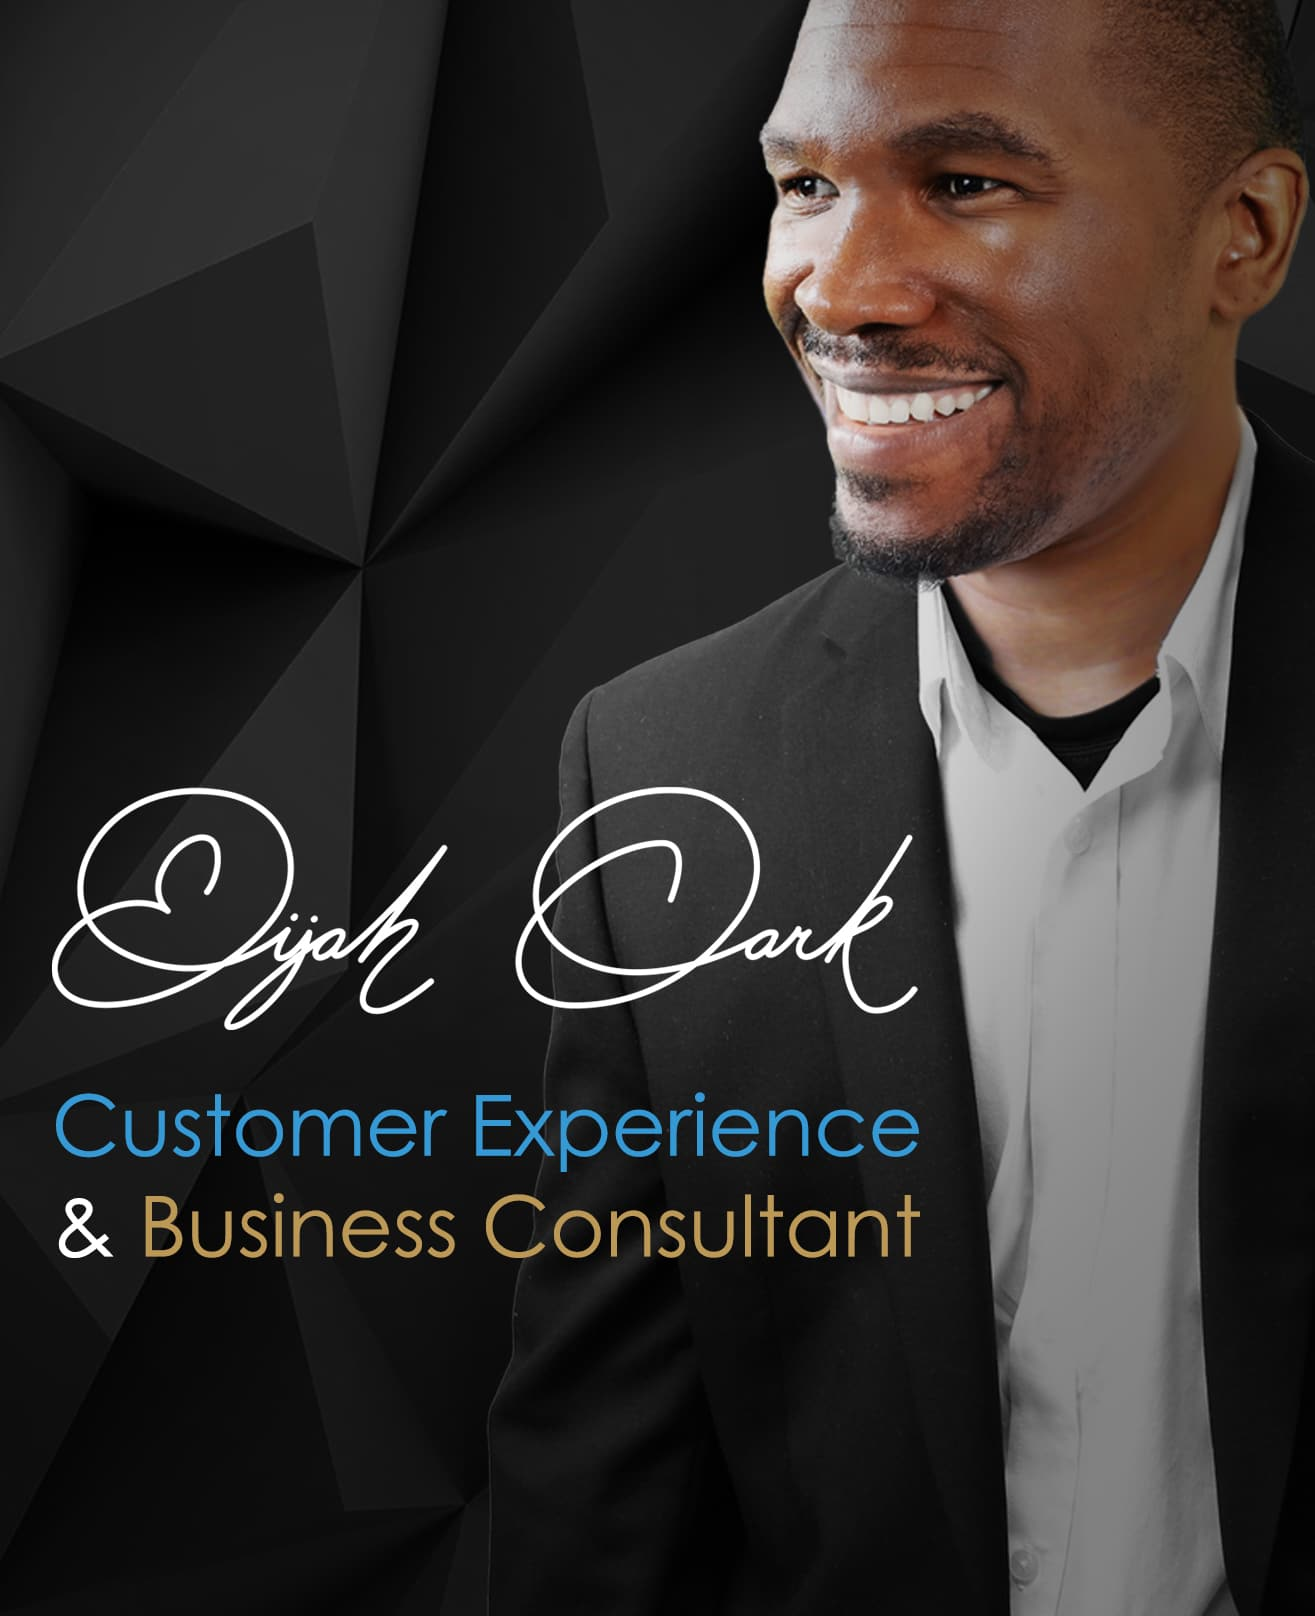 Dr Elijah Clark Business Consulting